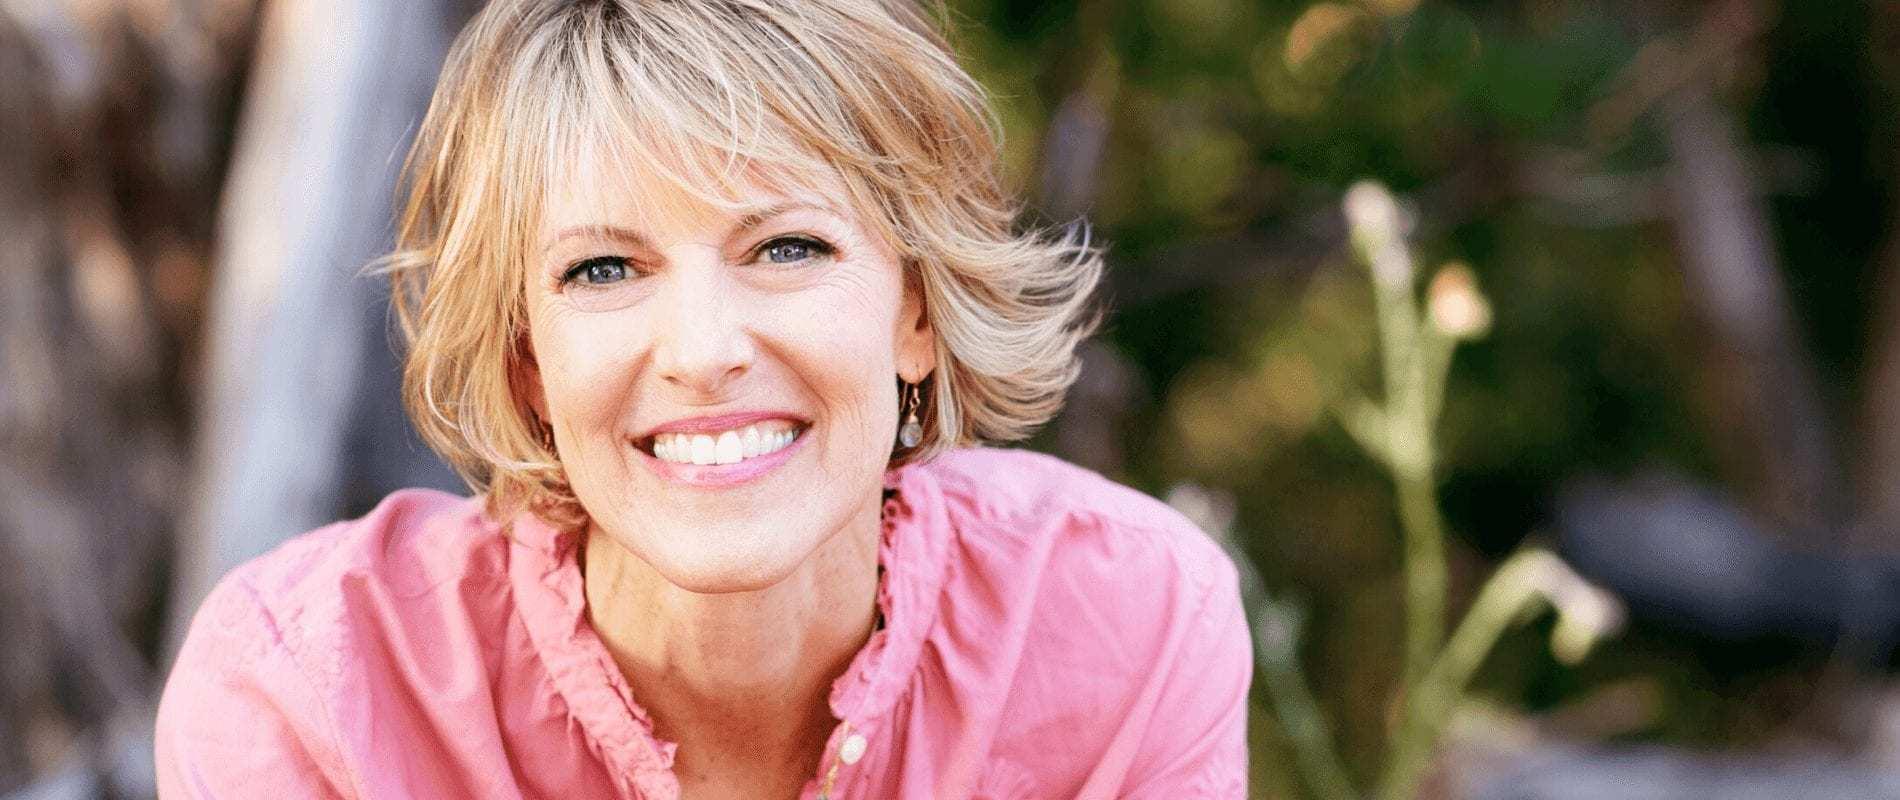 Elizabeth Hunter Diamond, clairvoyant & psychic energy healer, smiles in pink shirt.